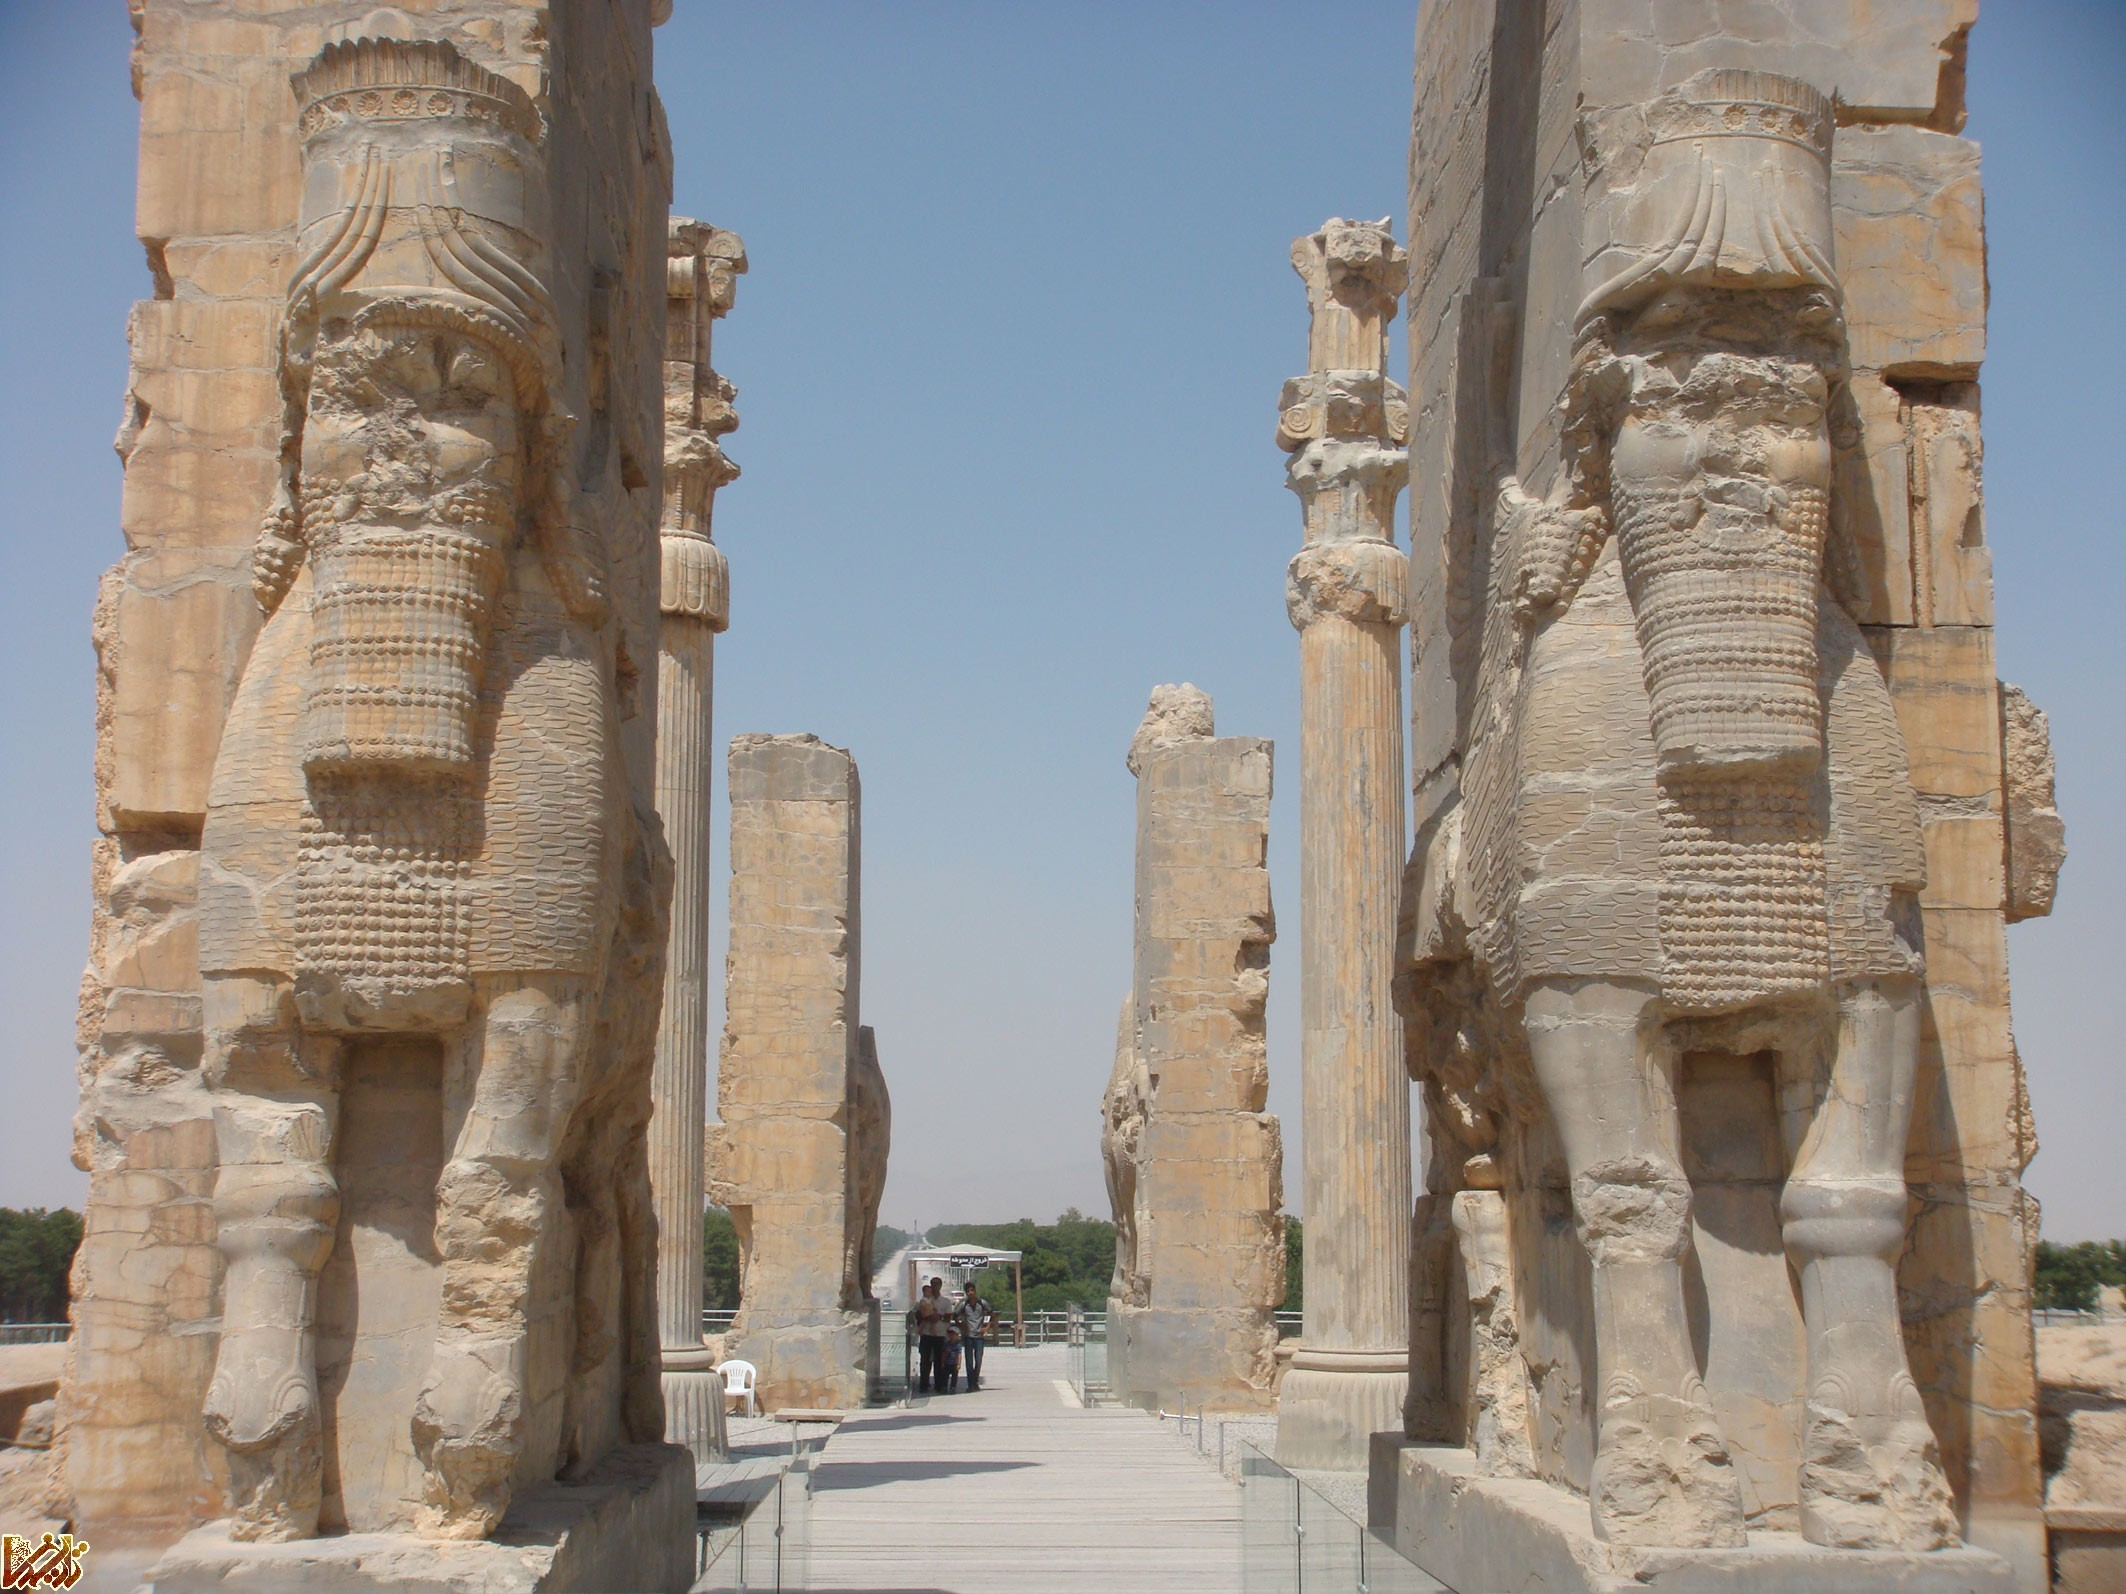 http://tarikhema.org/images/2011/08/509819264.jpg